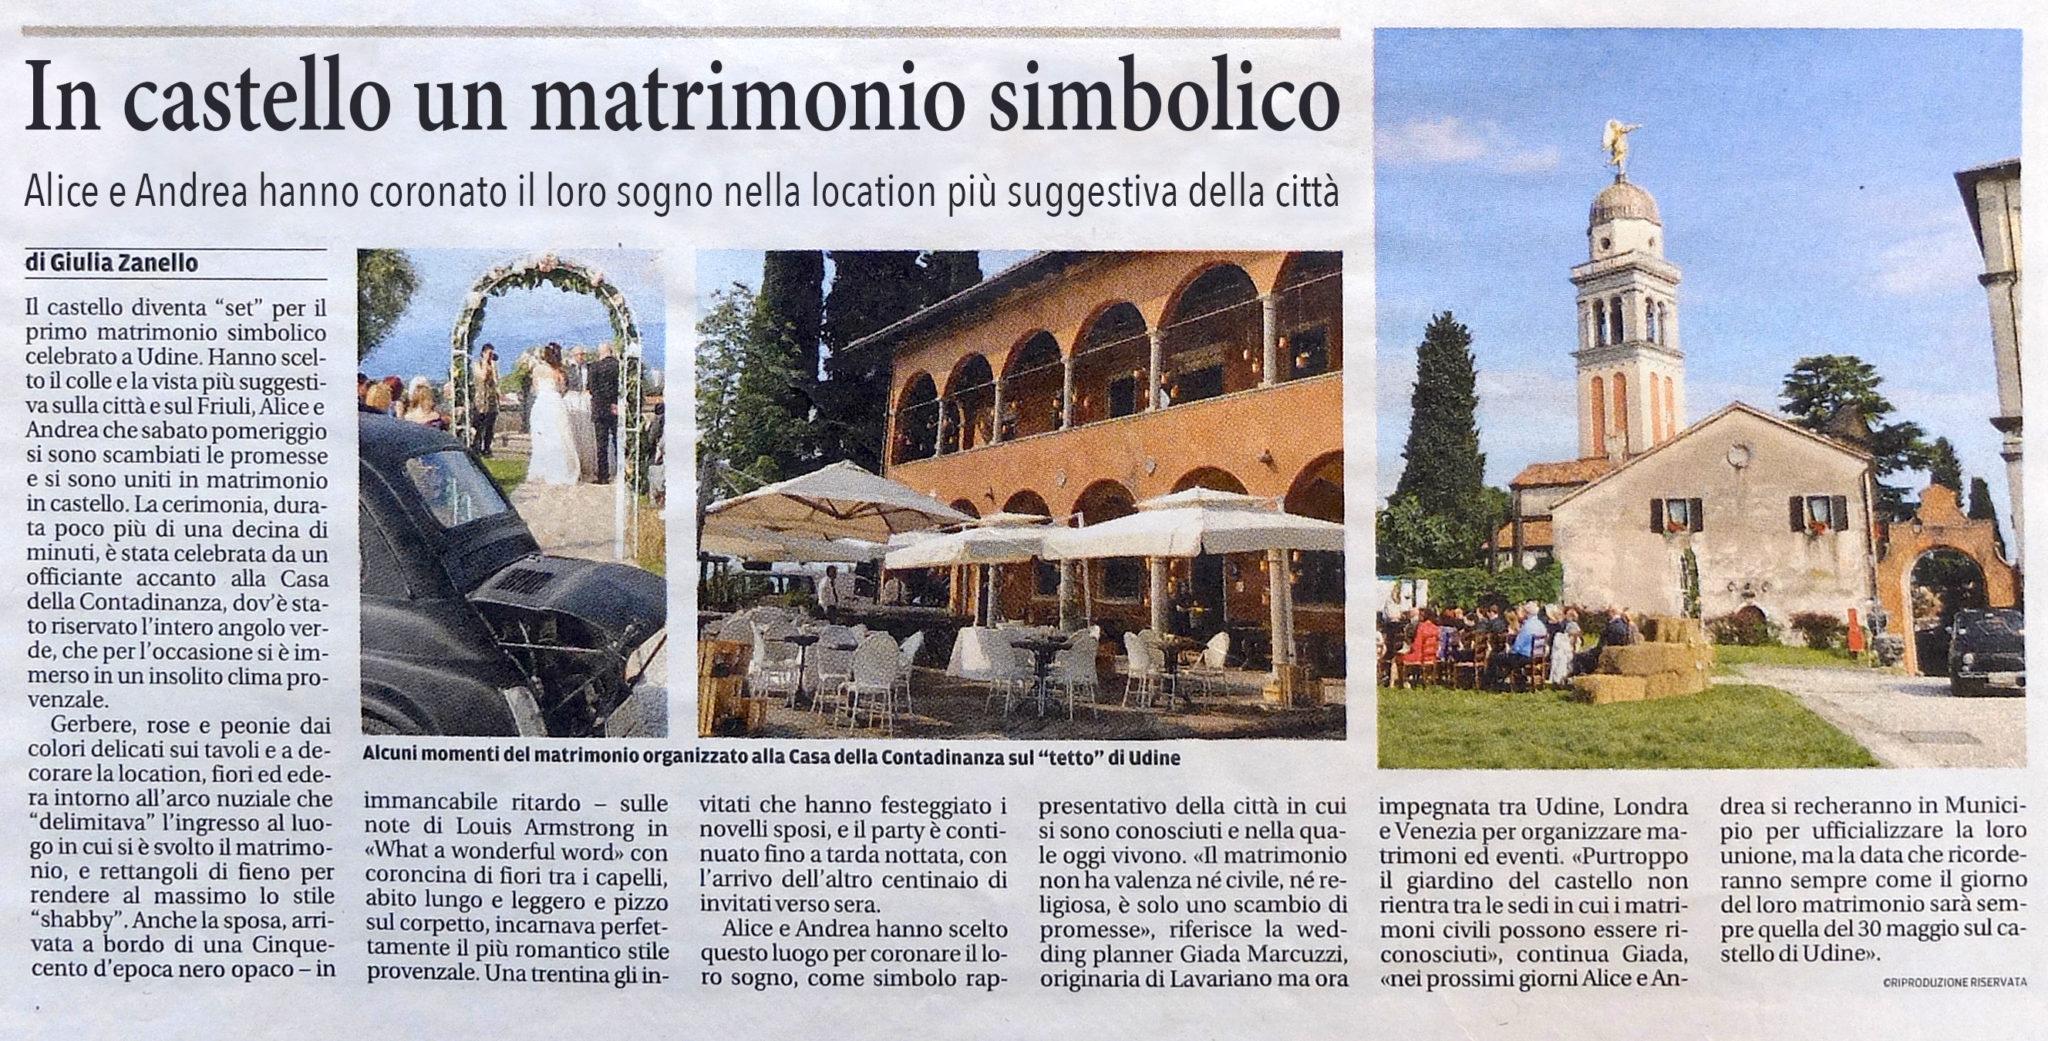 Matrimonio Simbolico Chi Lo Celebra : Rassegna stampa giada marcuzzi weddings